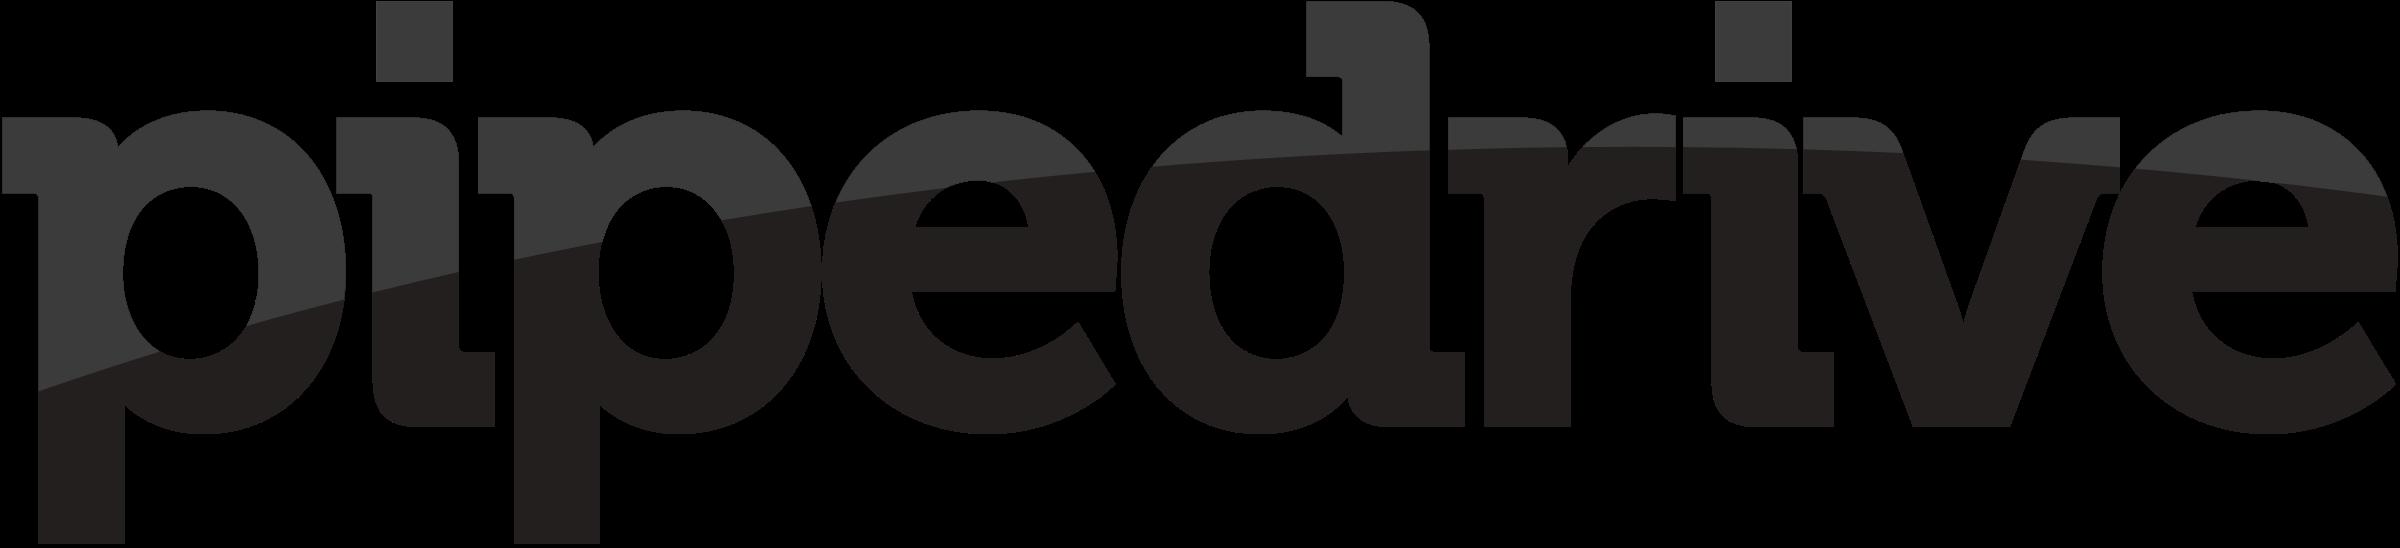 pipedrive-logo-png-transparent